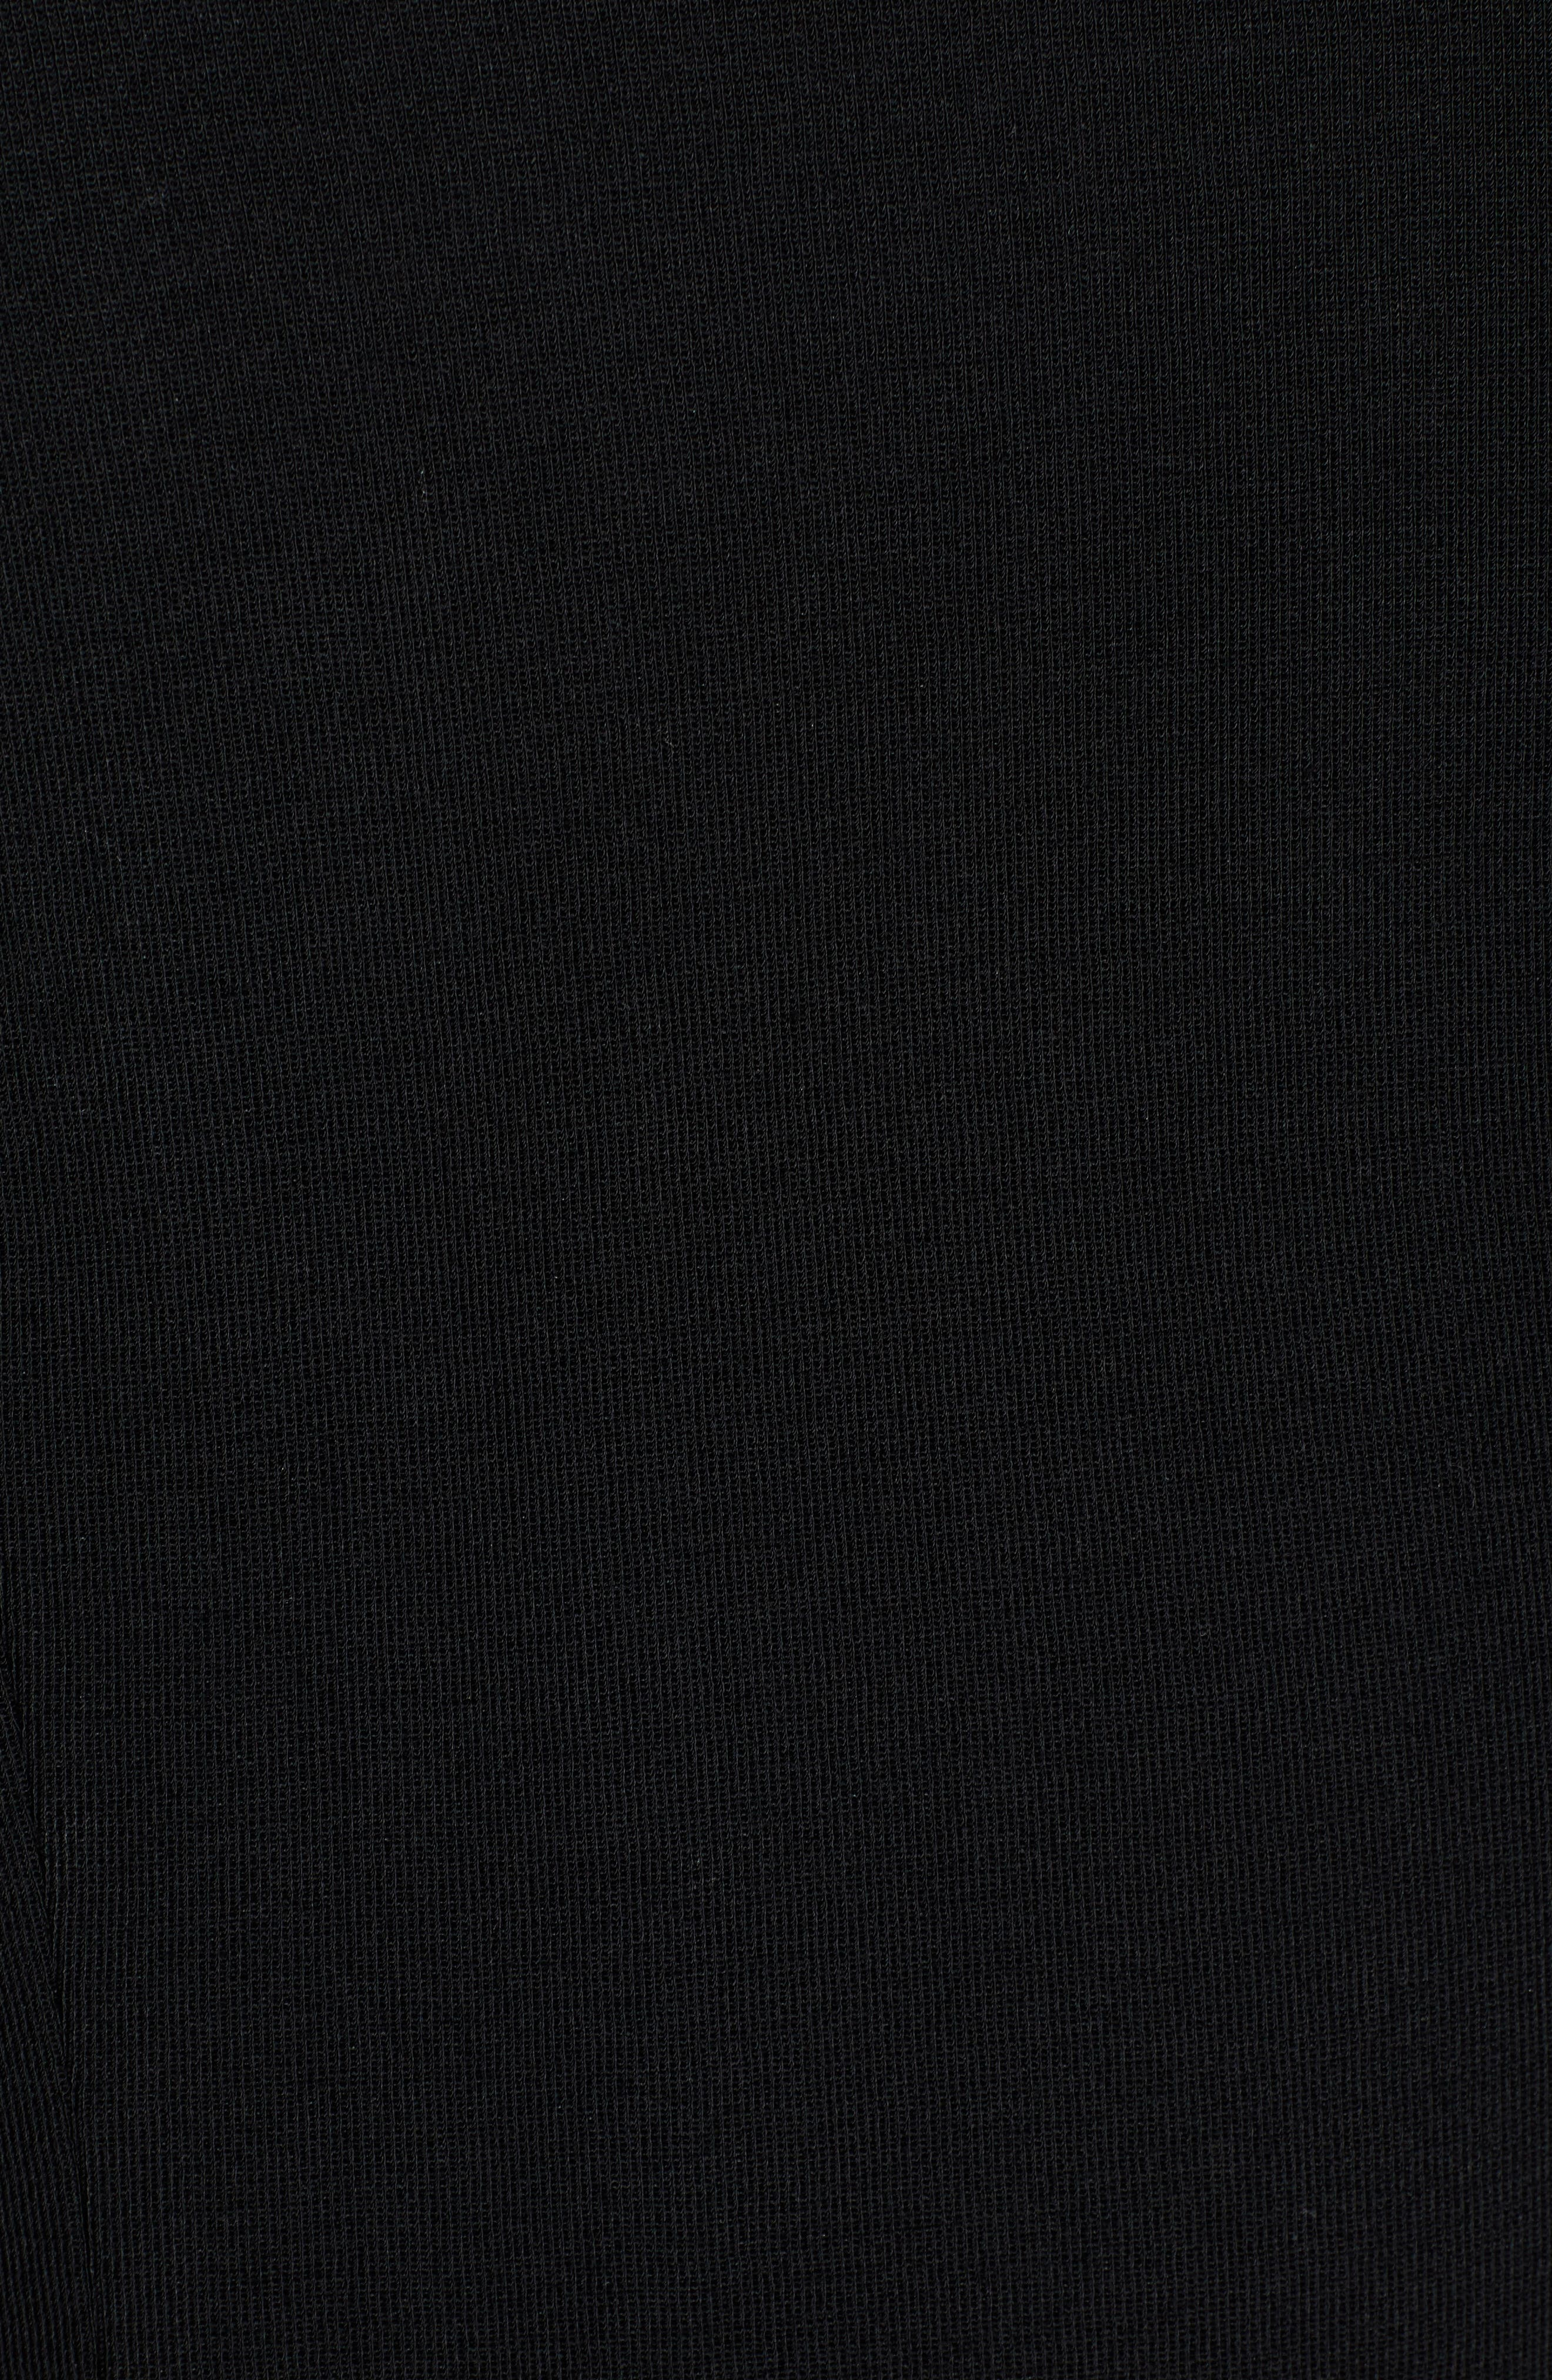 Contrast Jacquard Sweater Jacket,                             Alternate thumbnail 7, color,                             BLACK/ WHITE